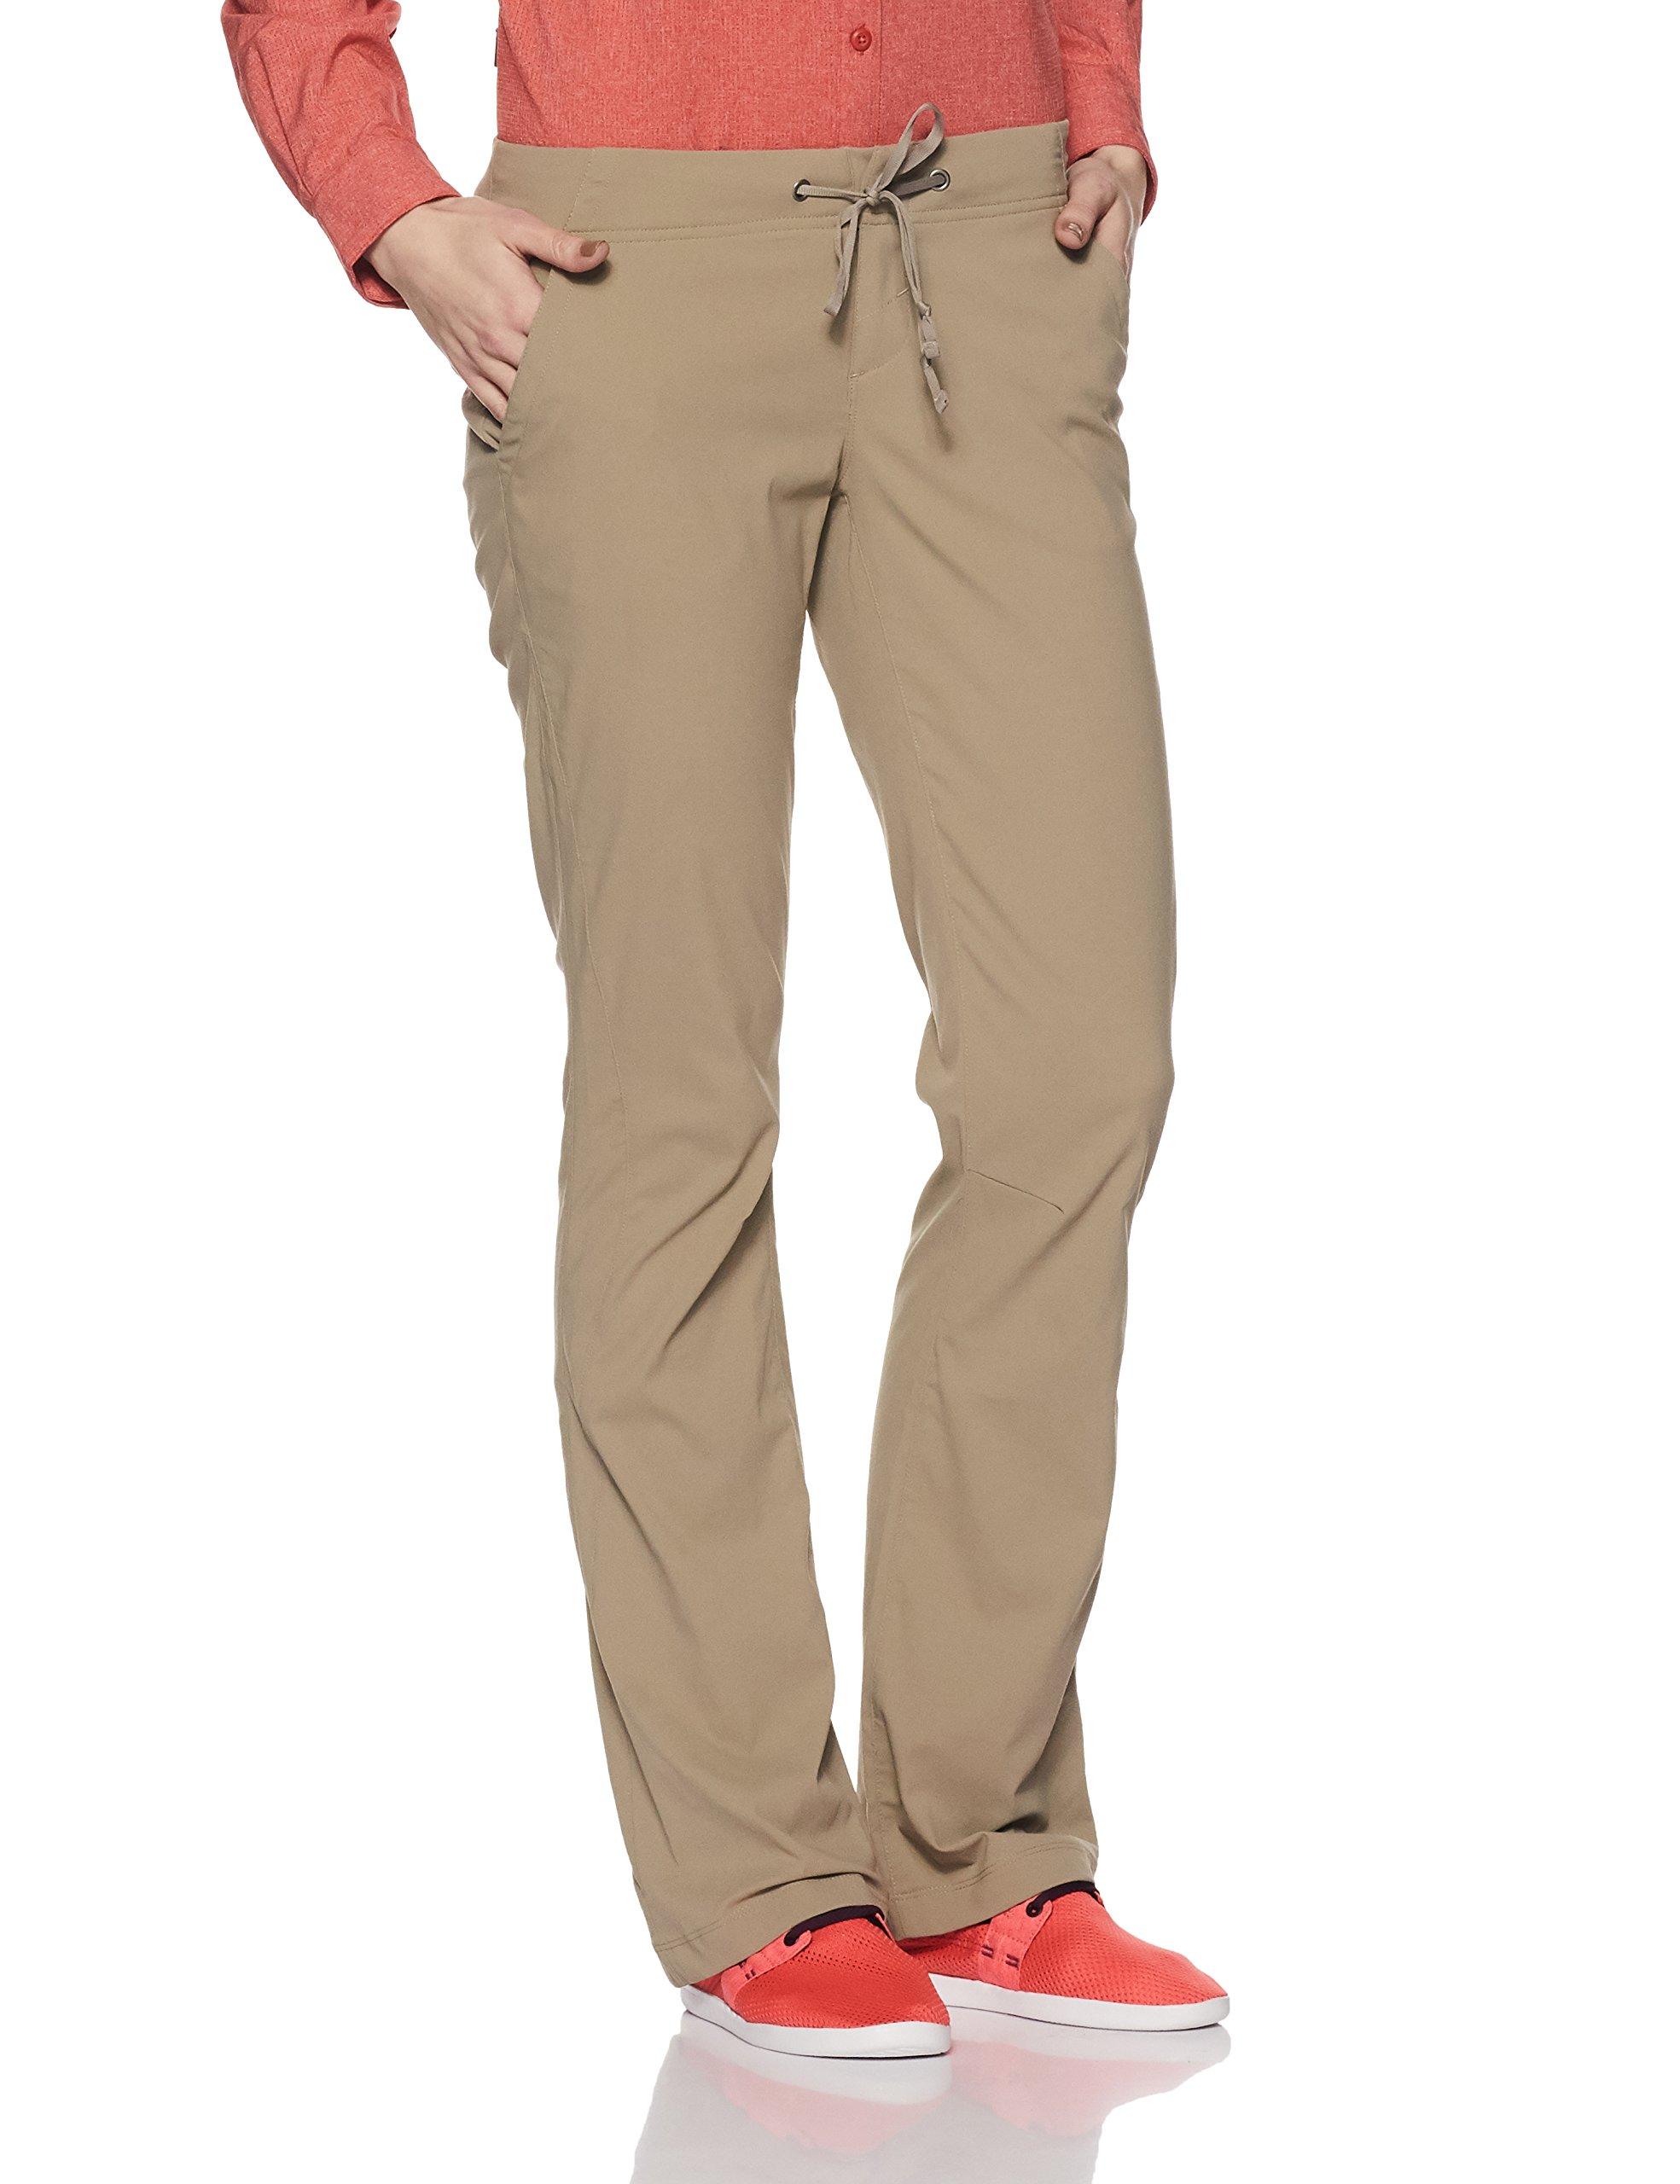 Columbia Women's Anytime Outdoor Boot Cut Pant Pants, tusk, 8Regular